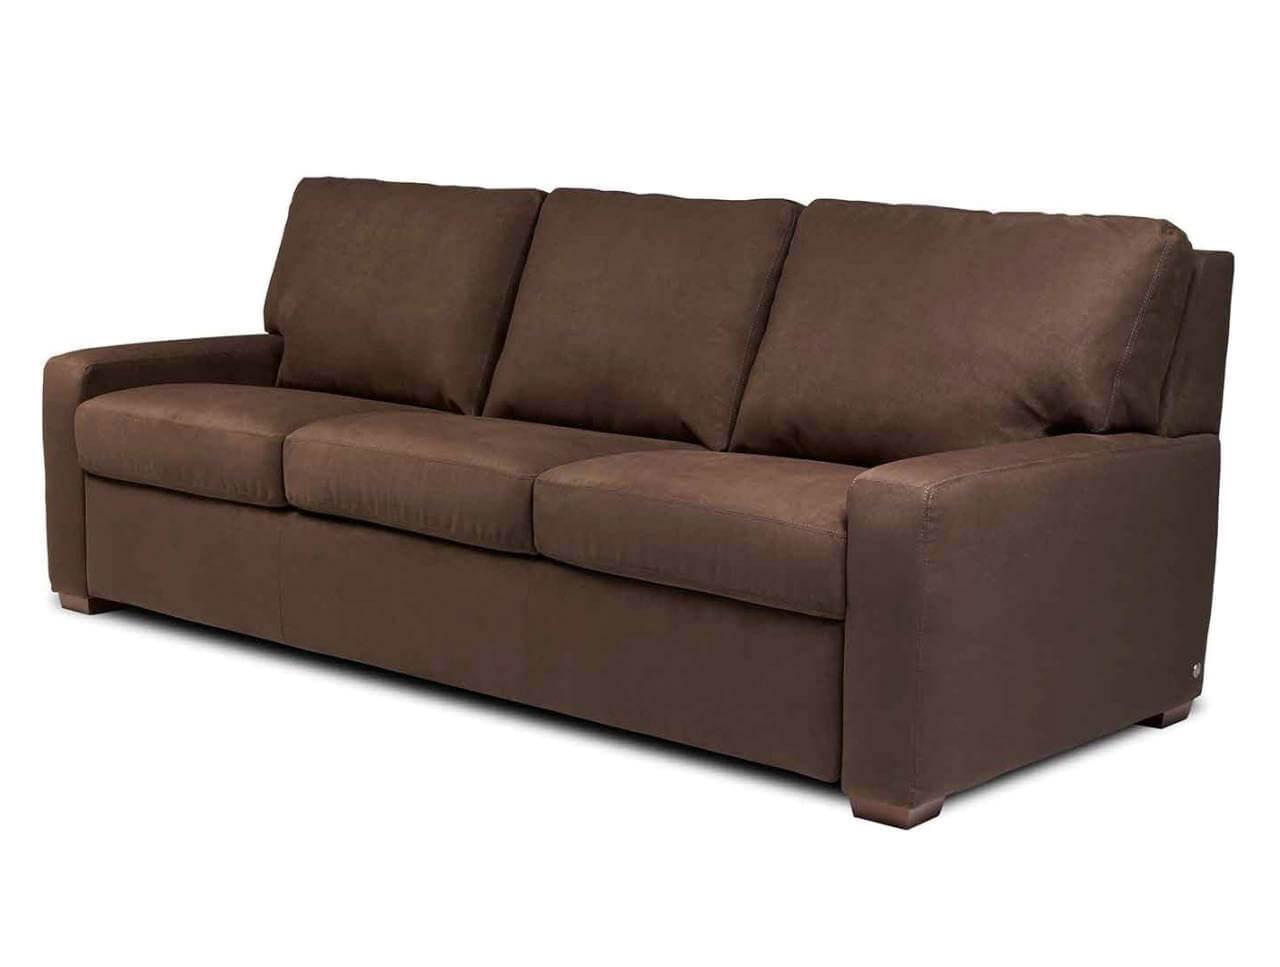 sofa and chairs bloomington mn mattress sizes carson sofas of minnesota